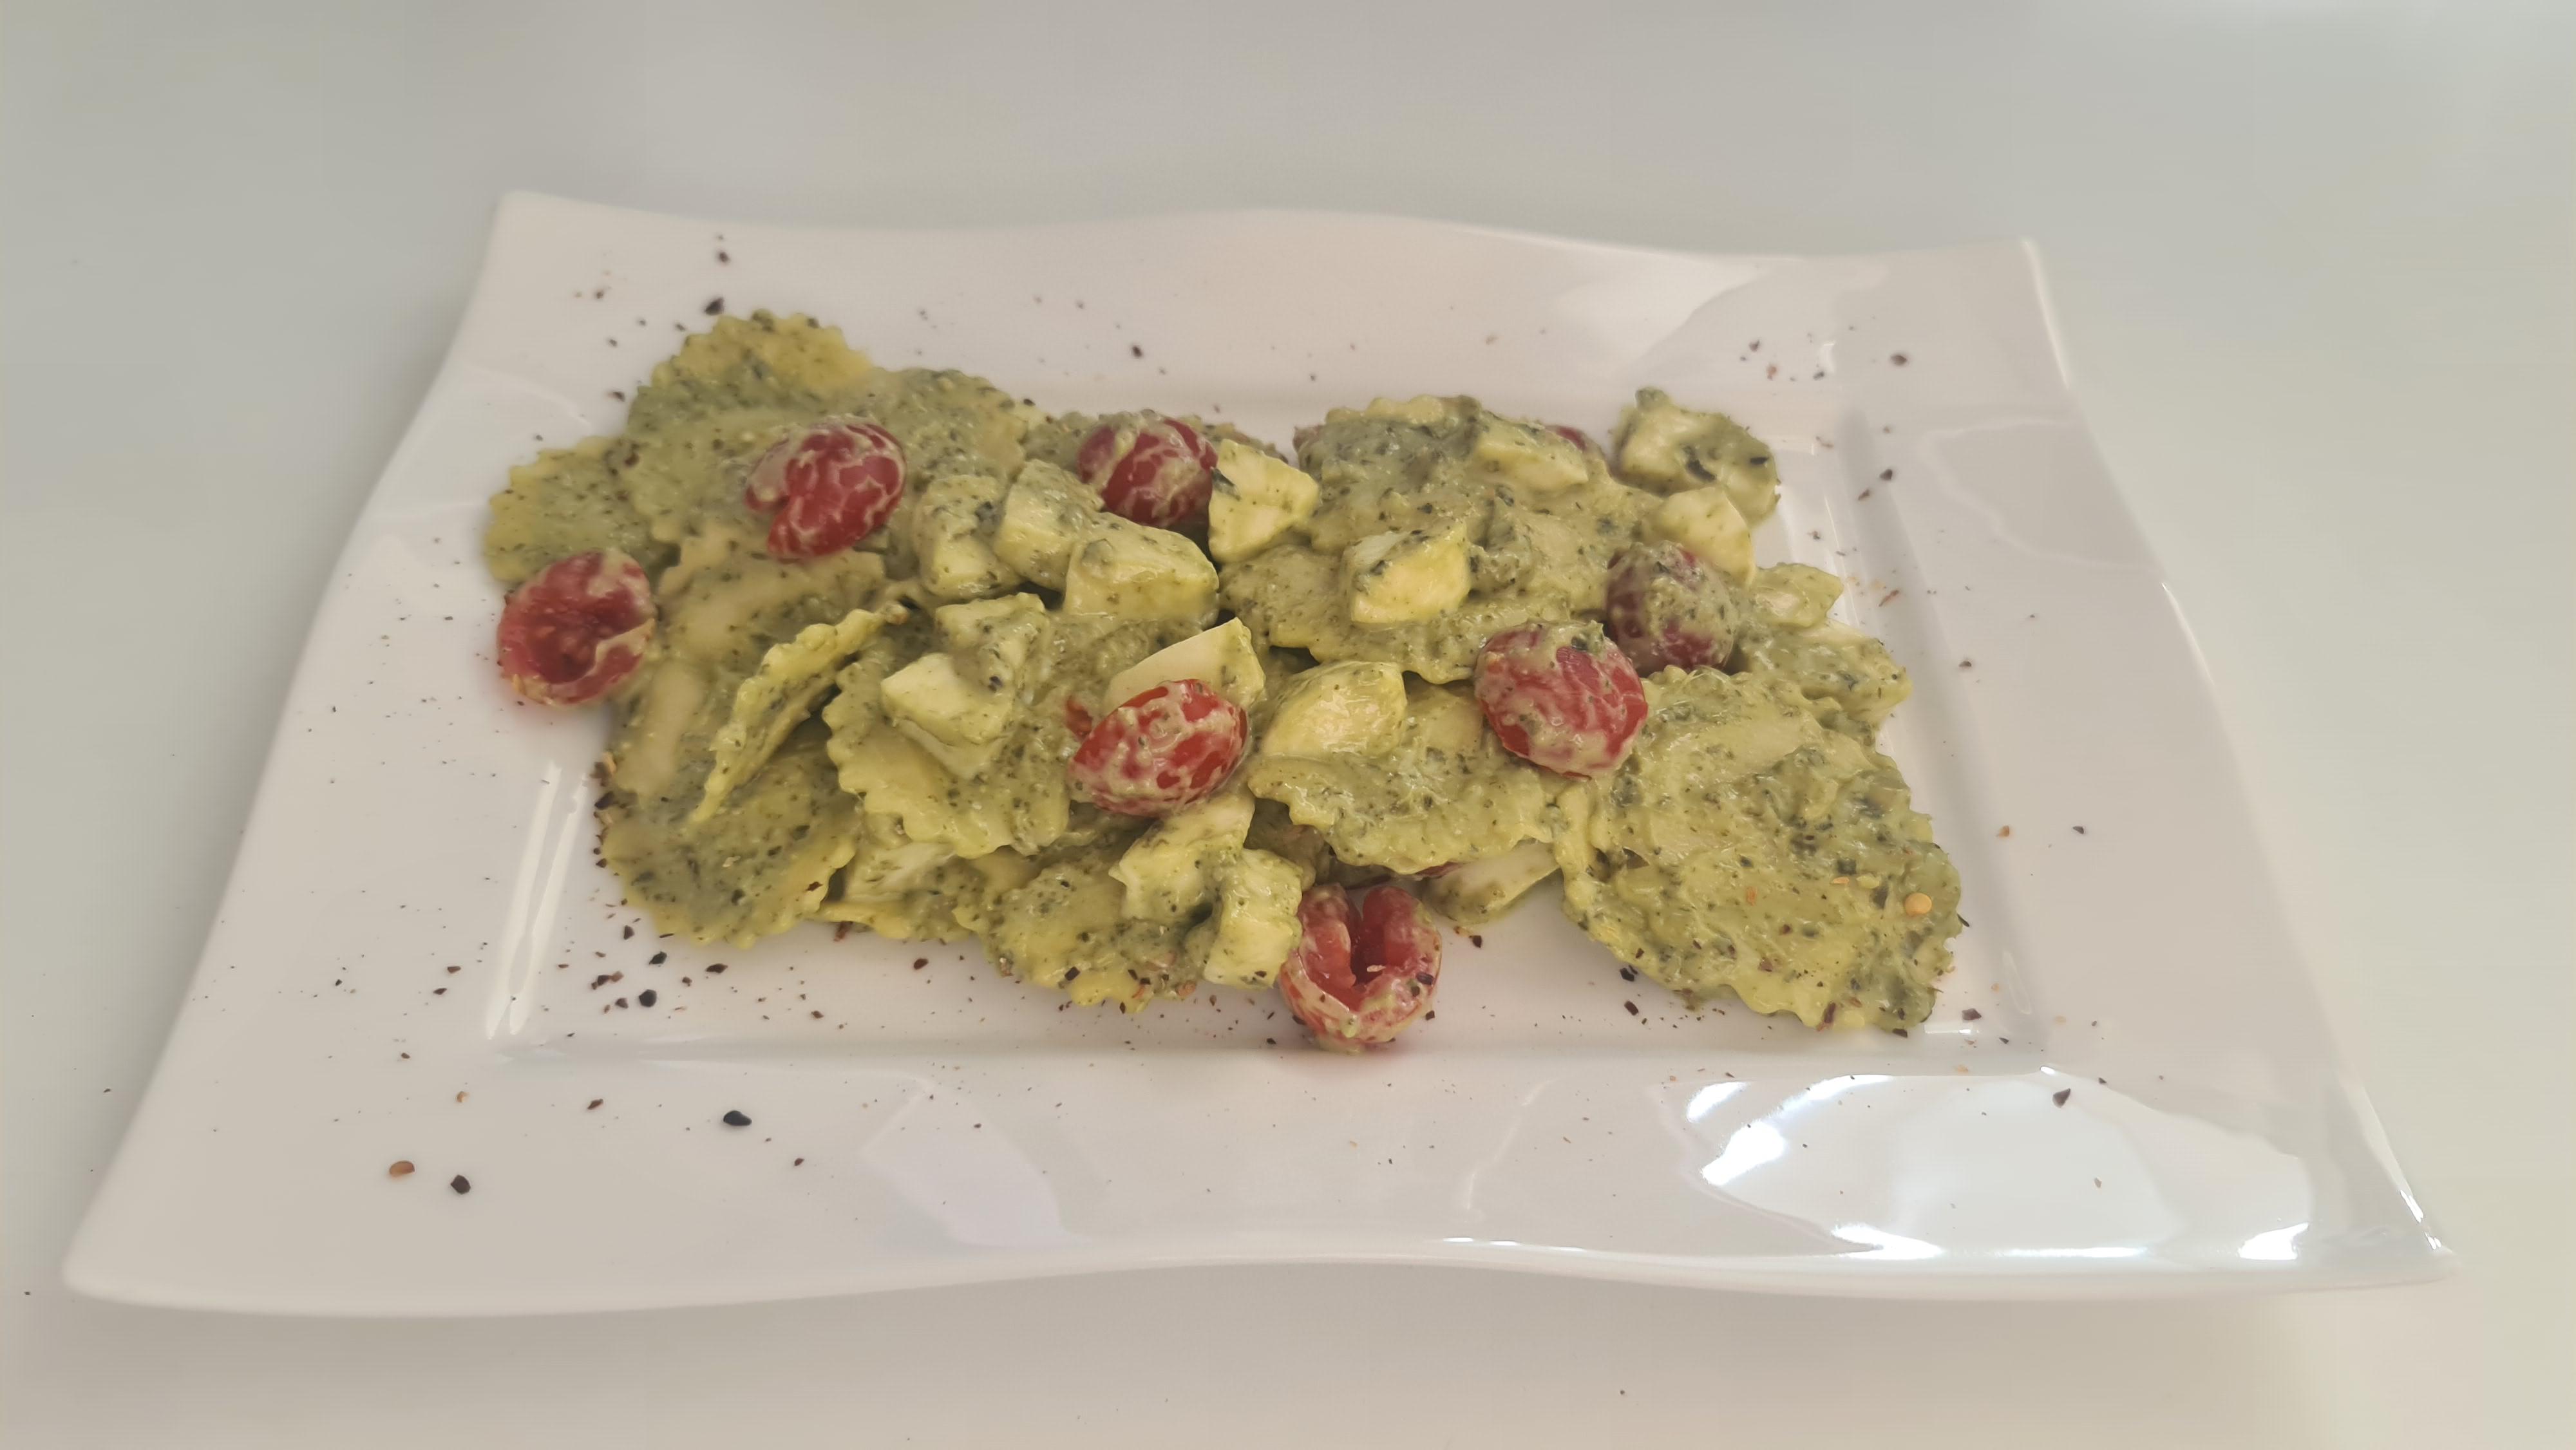 https://foodloader.net/Holz_2020-06-19_Trueffel-Ricotta-Tortellini_mit_Tomate_und_Mozzarella_in_Pesto_Basilico.jpg